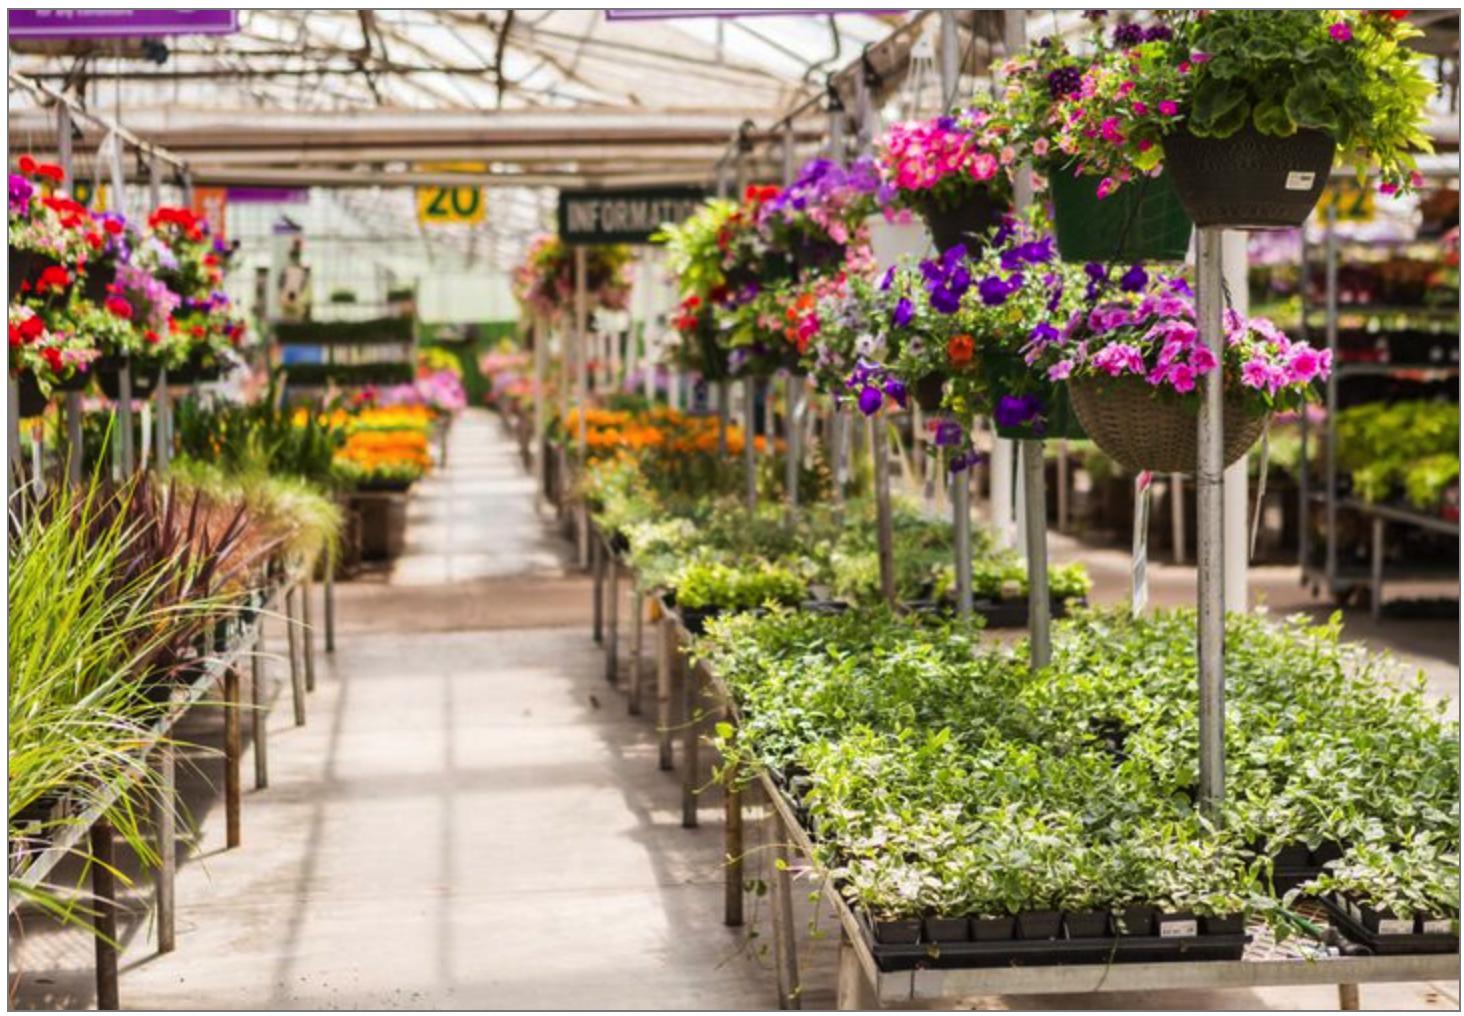 Garden Centre Sales Grew By 4.5% in 2019